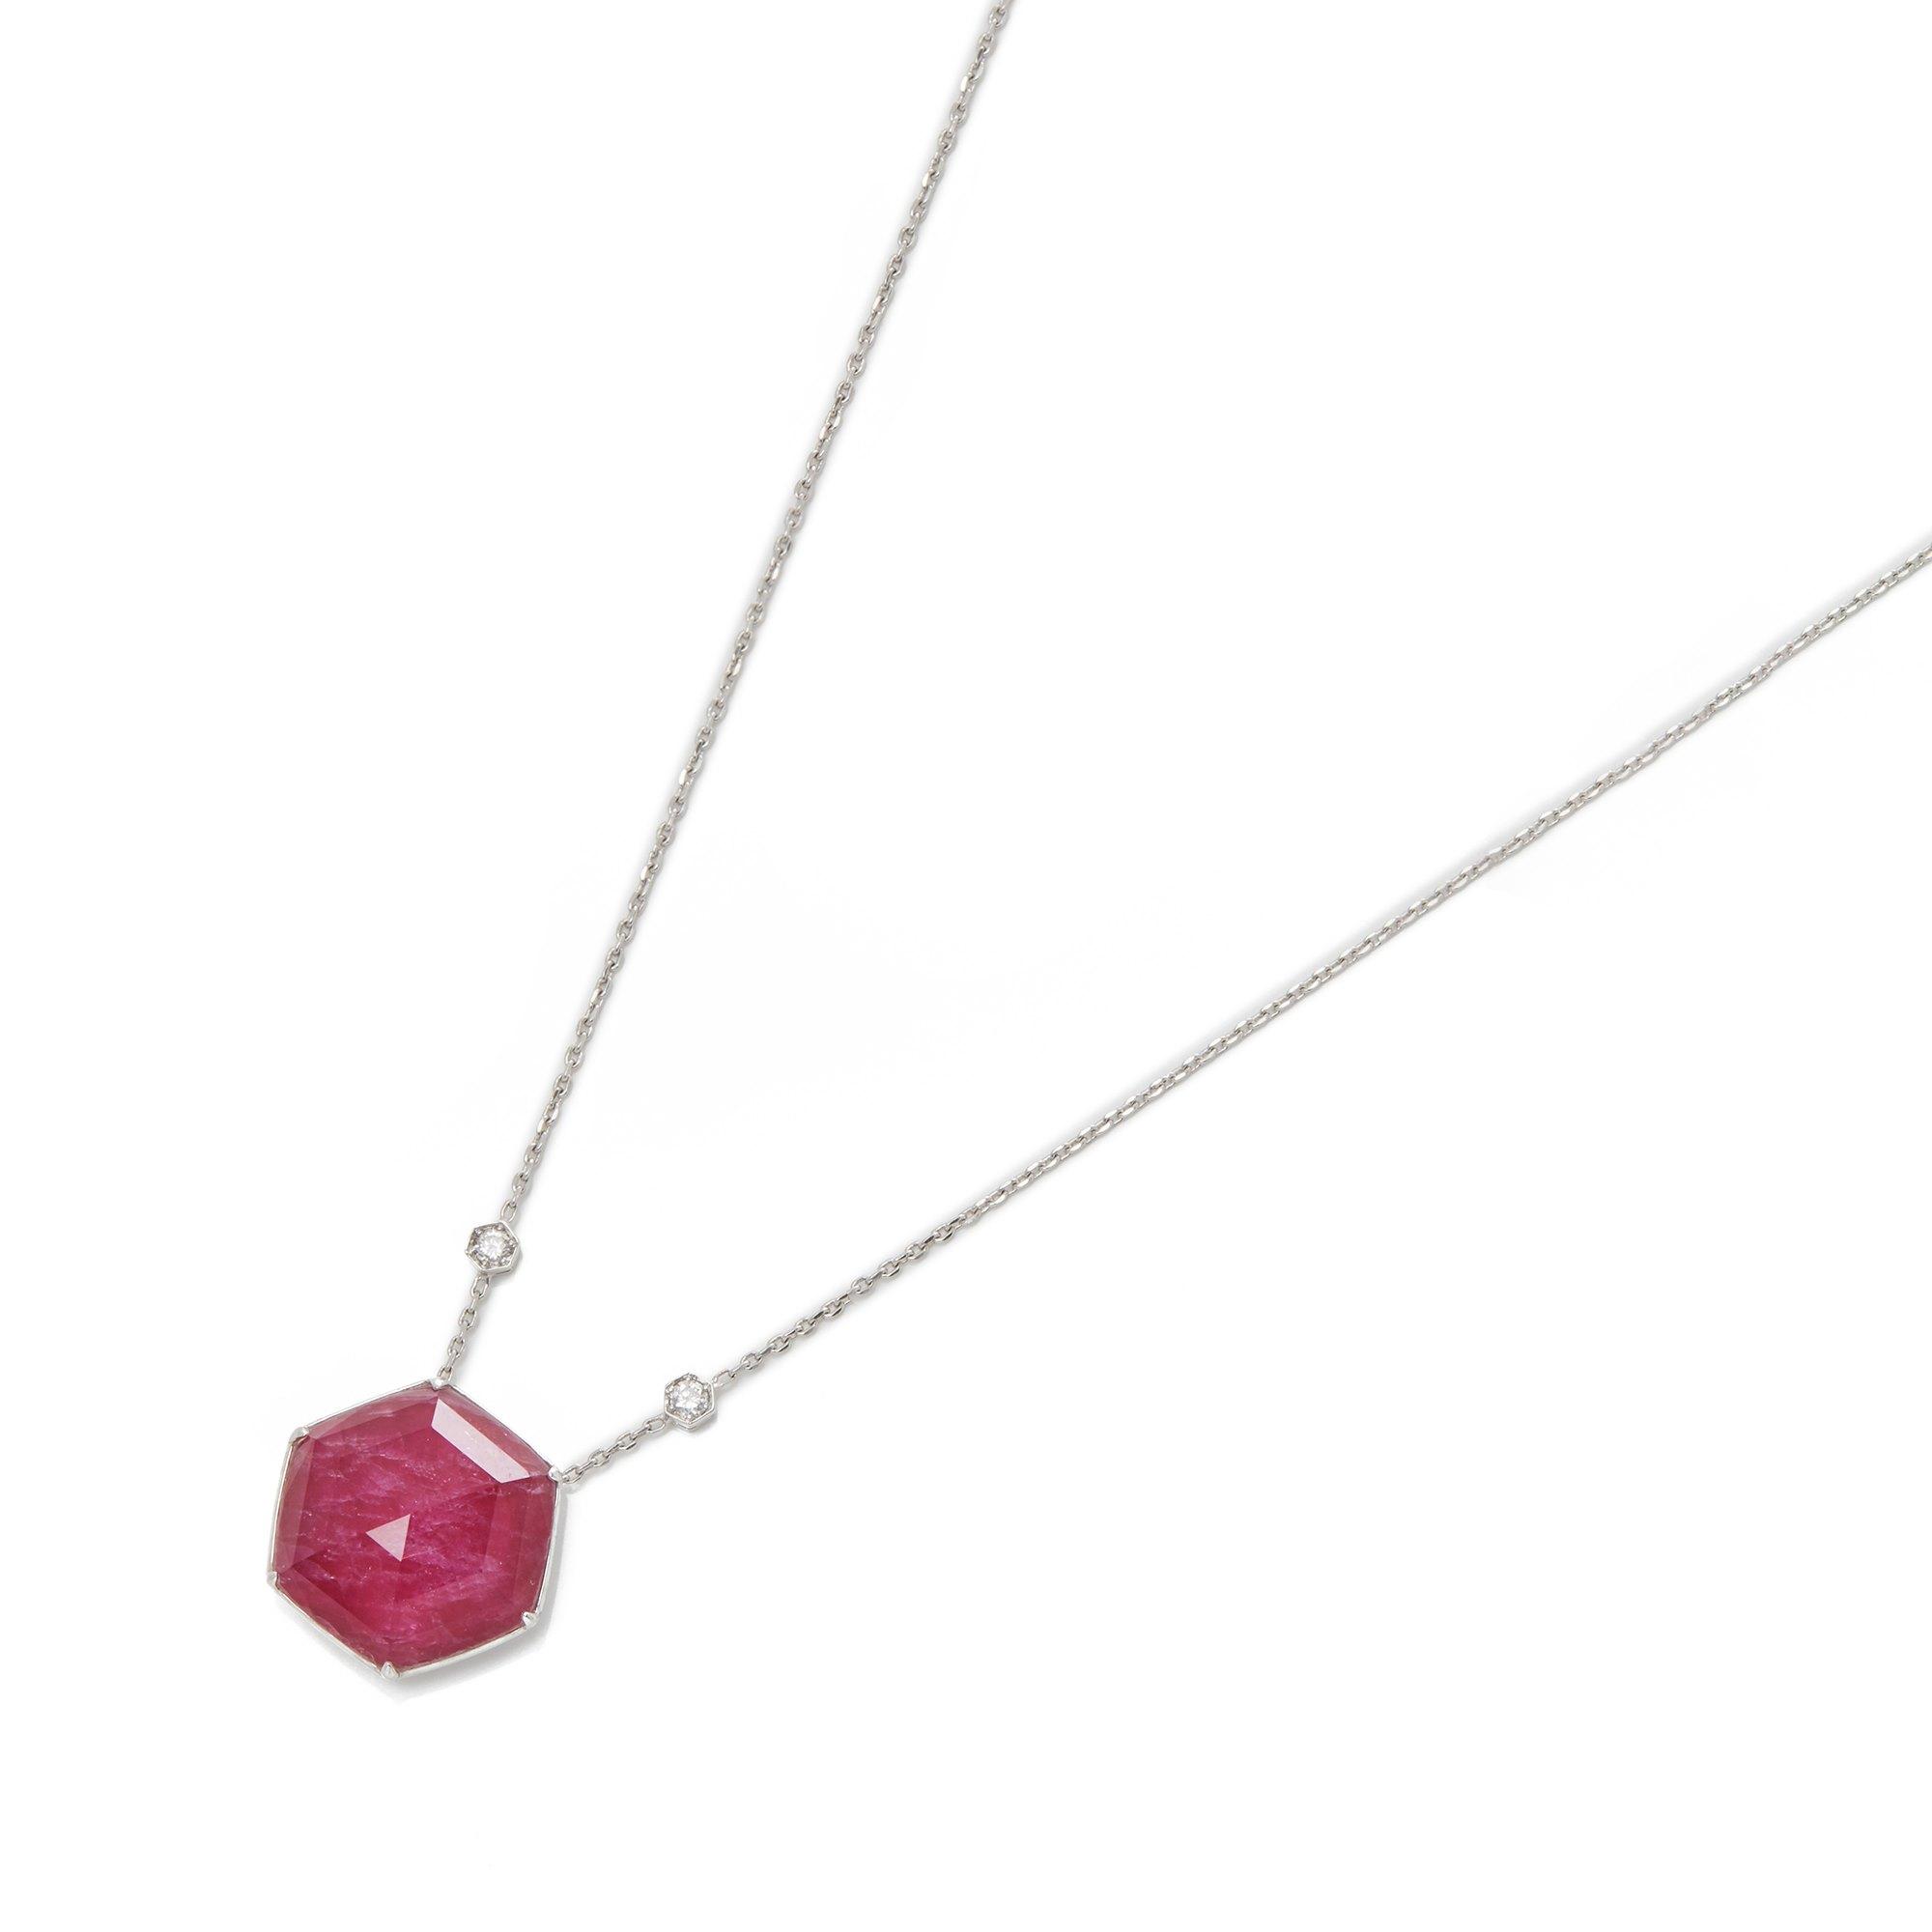 Stephen Webster Deco Haze 18ct White Gold Ruby Quartz and Diamond Pendant